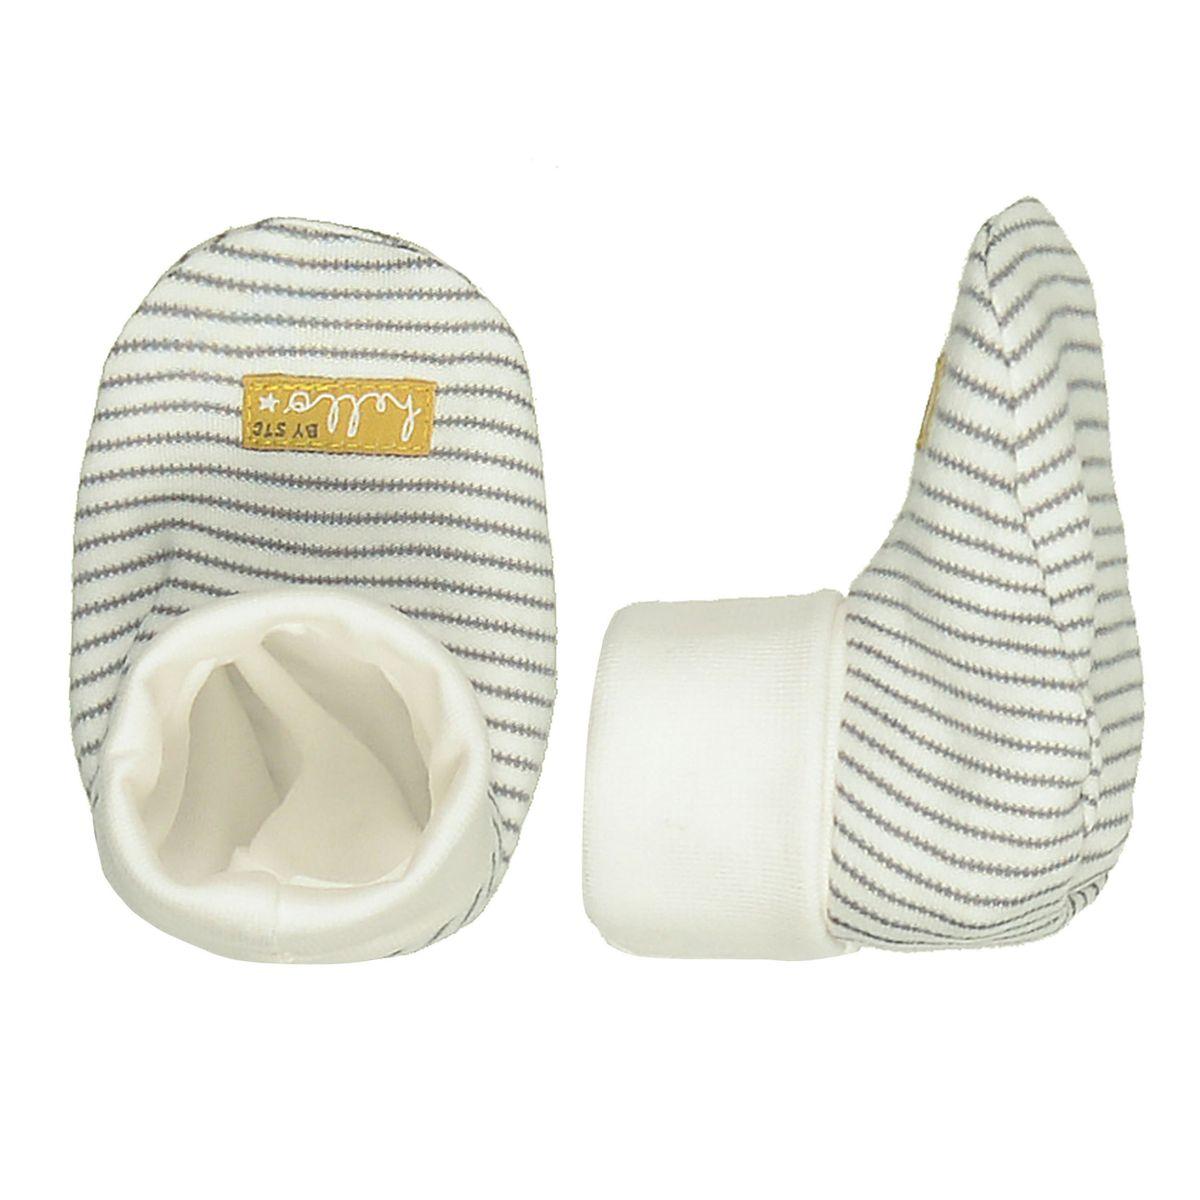 ORGANIC COTTON Schuhe mit Allover-Print - Offwhite